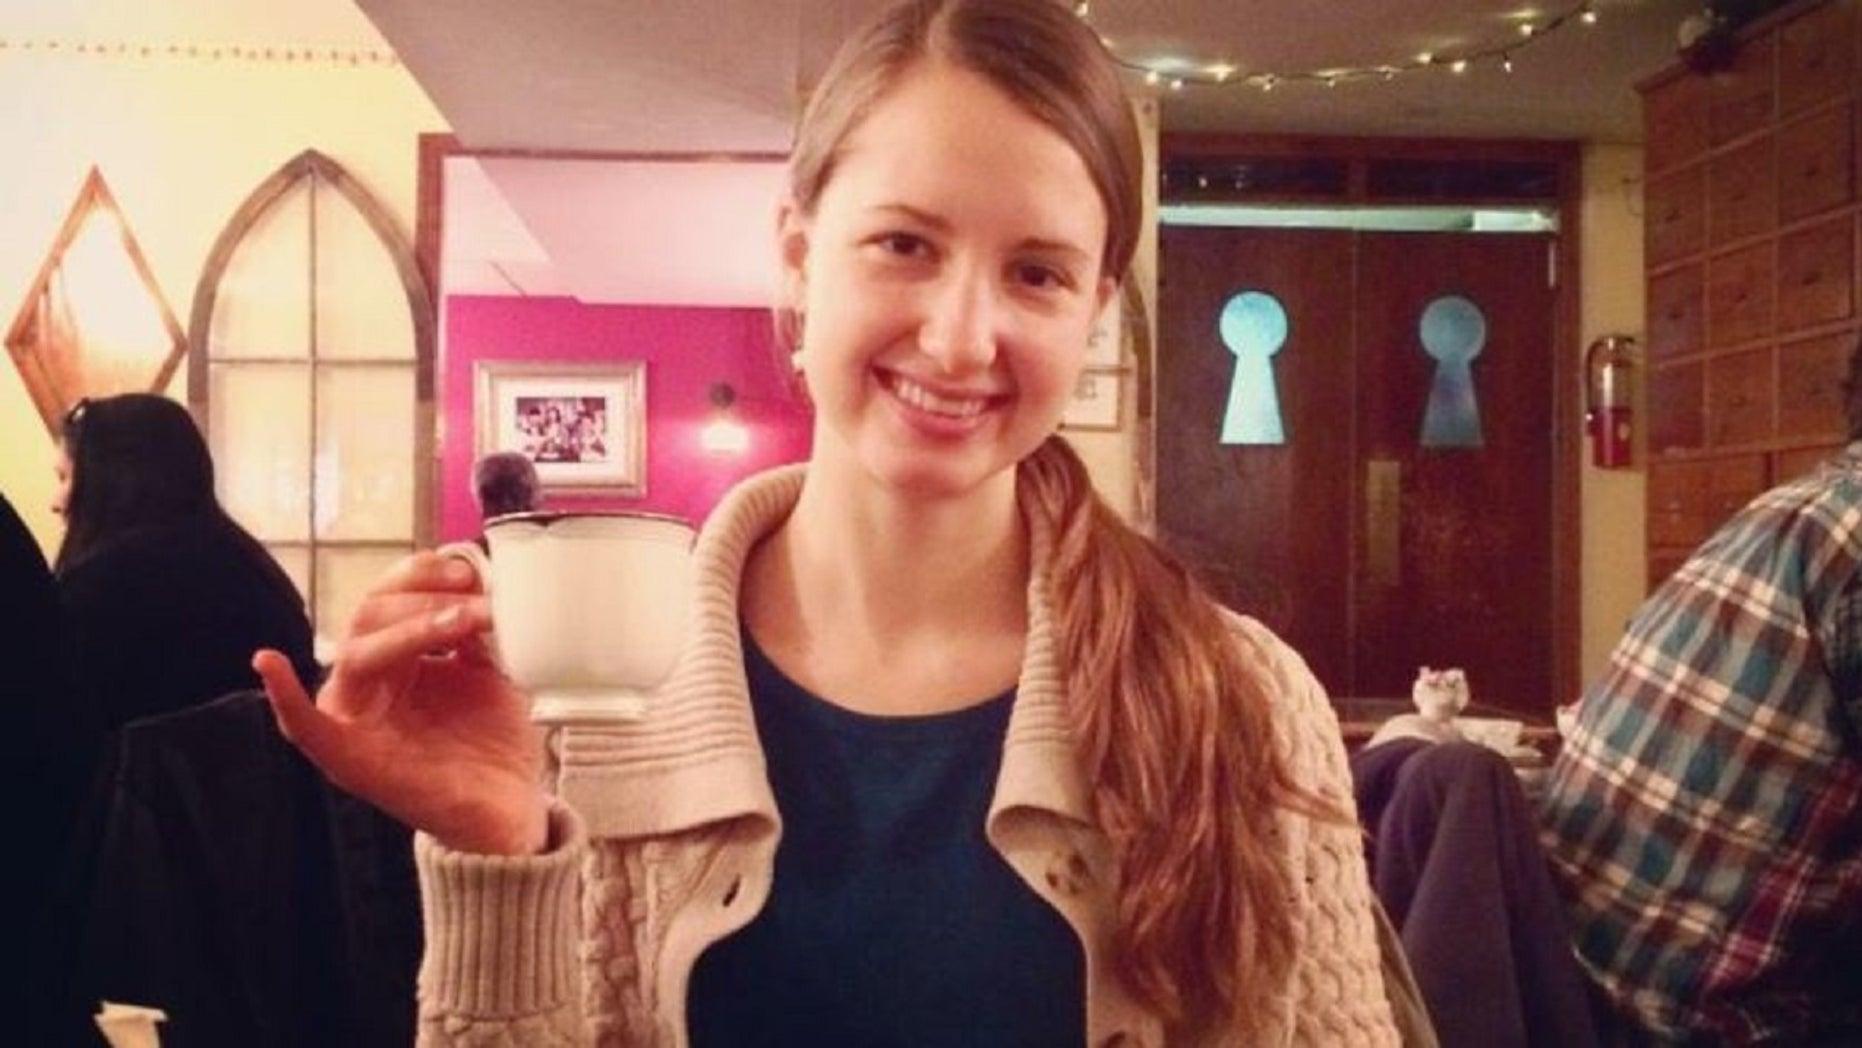 Raffaella Maria Stroik, 23, of the St. Louis Ballet was last seen Monday, authorities say.